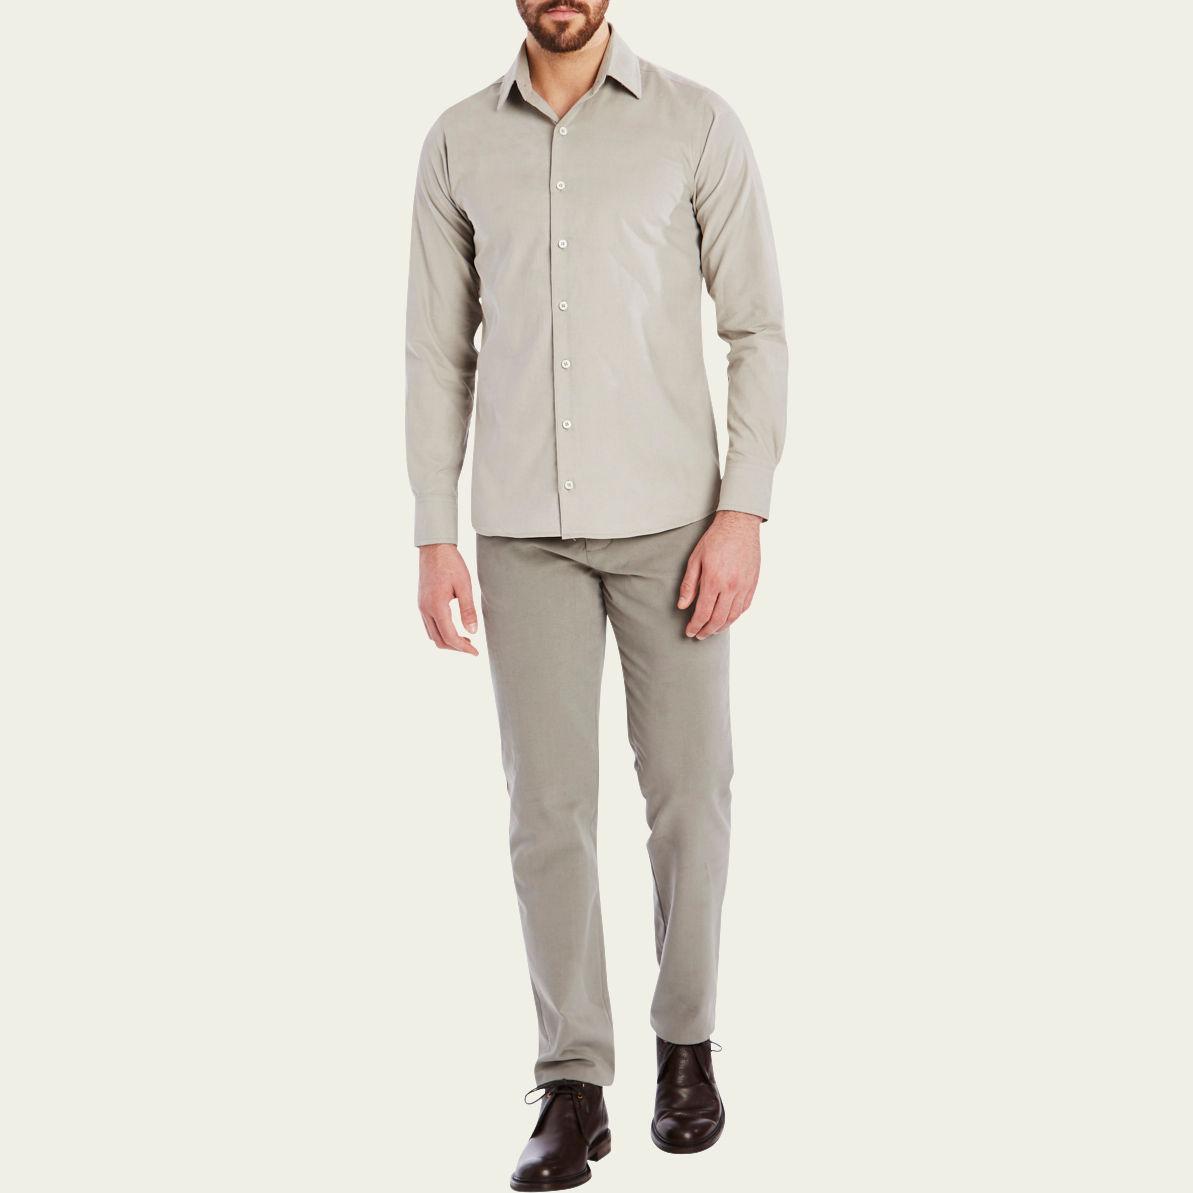 Mushroom Cord Plain Collar Shirt 2